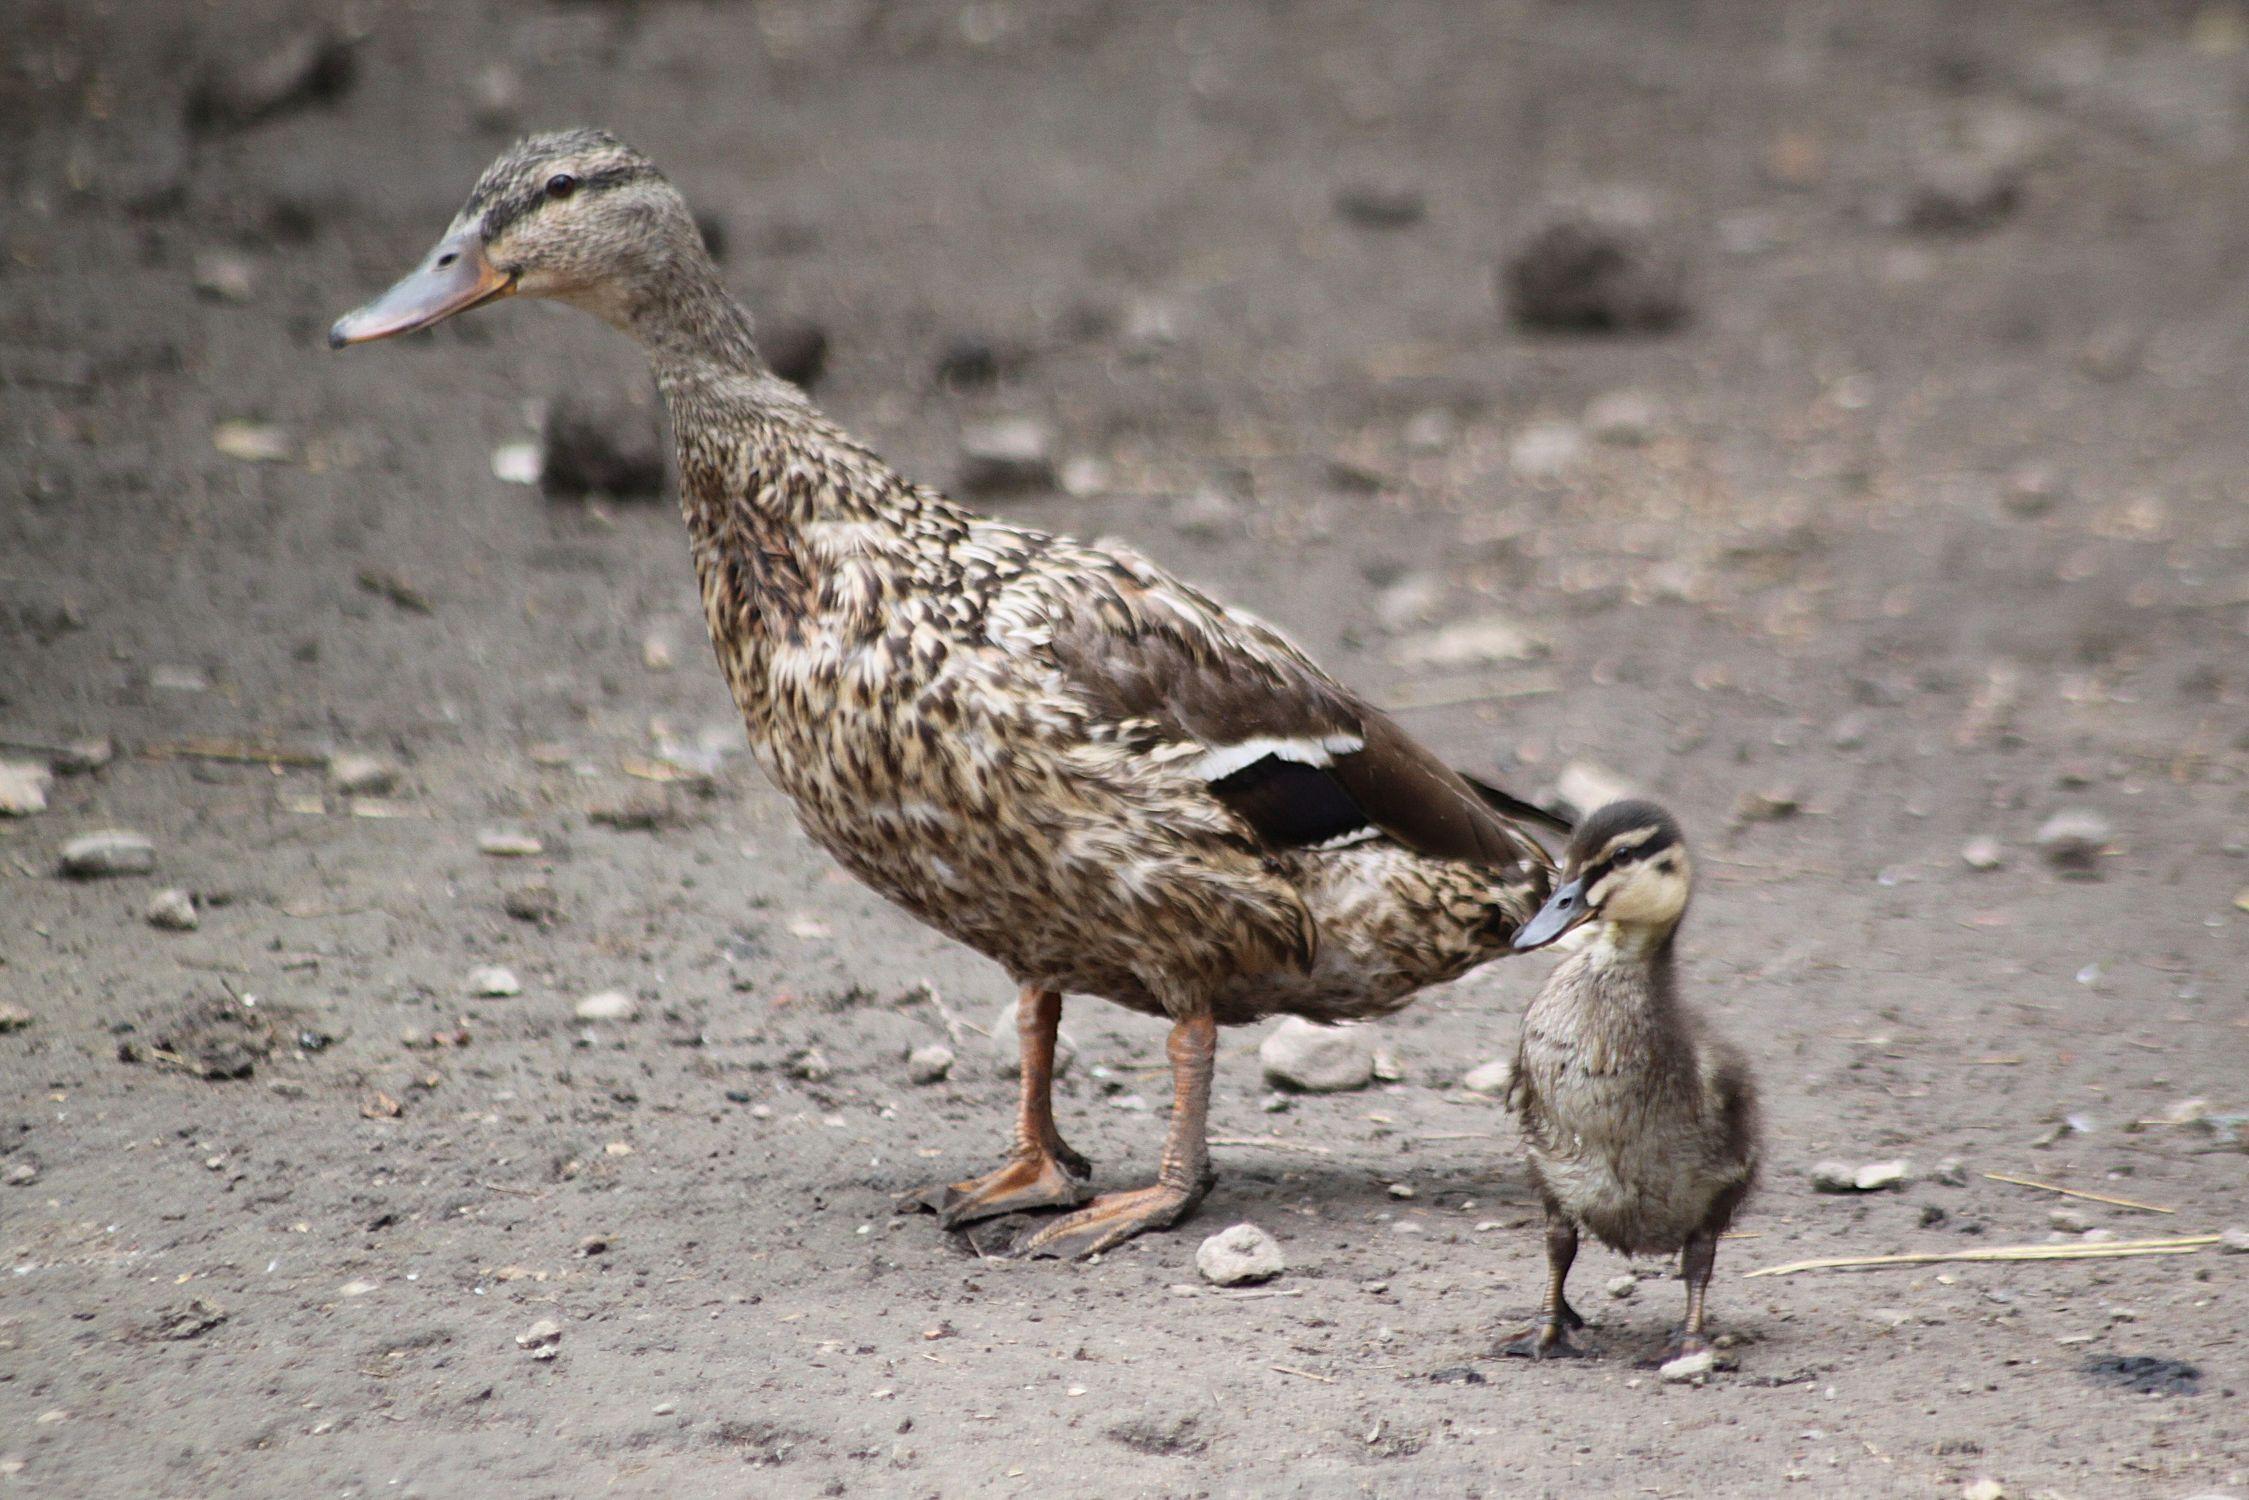 Bild mit Tiere, Natur, Natur, Vögel, Vögel, Enten, Tier, Ente